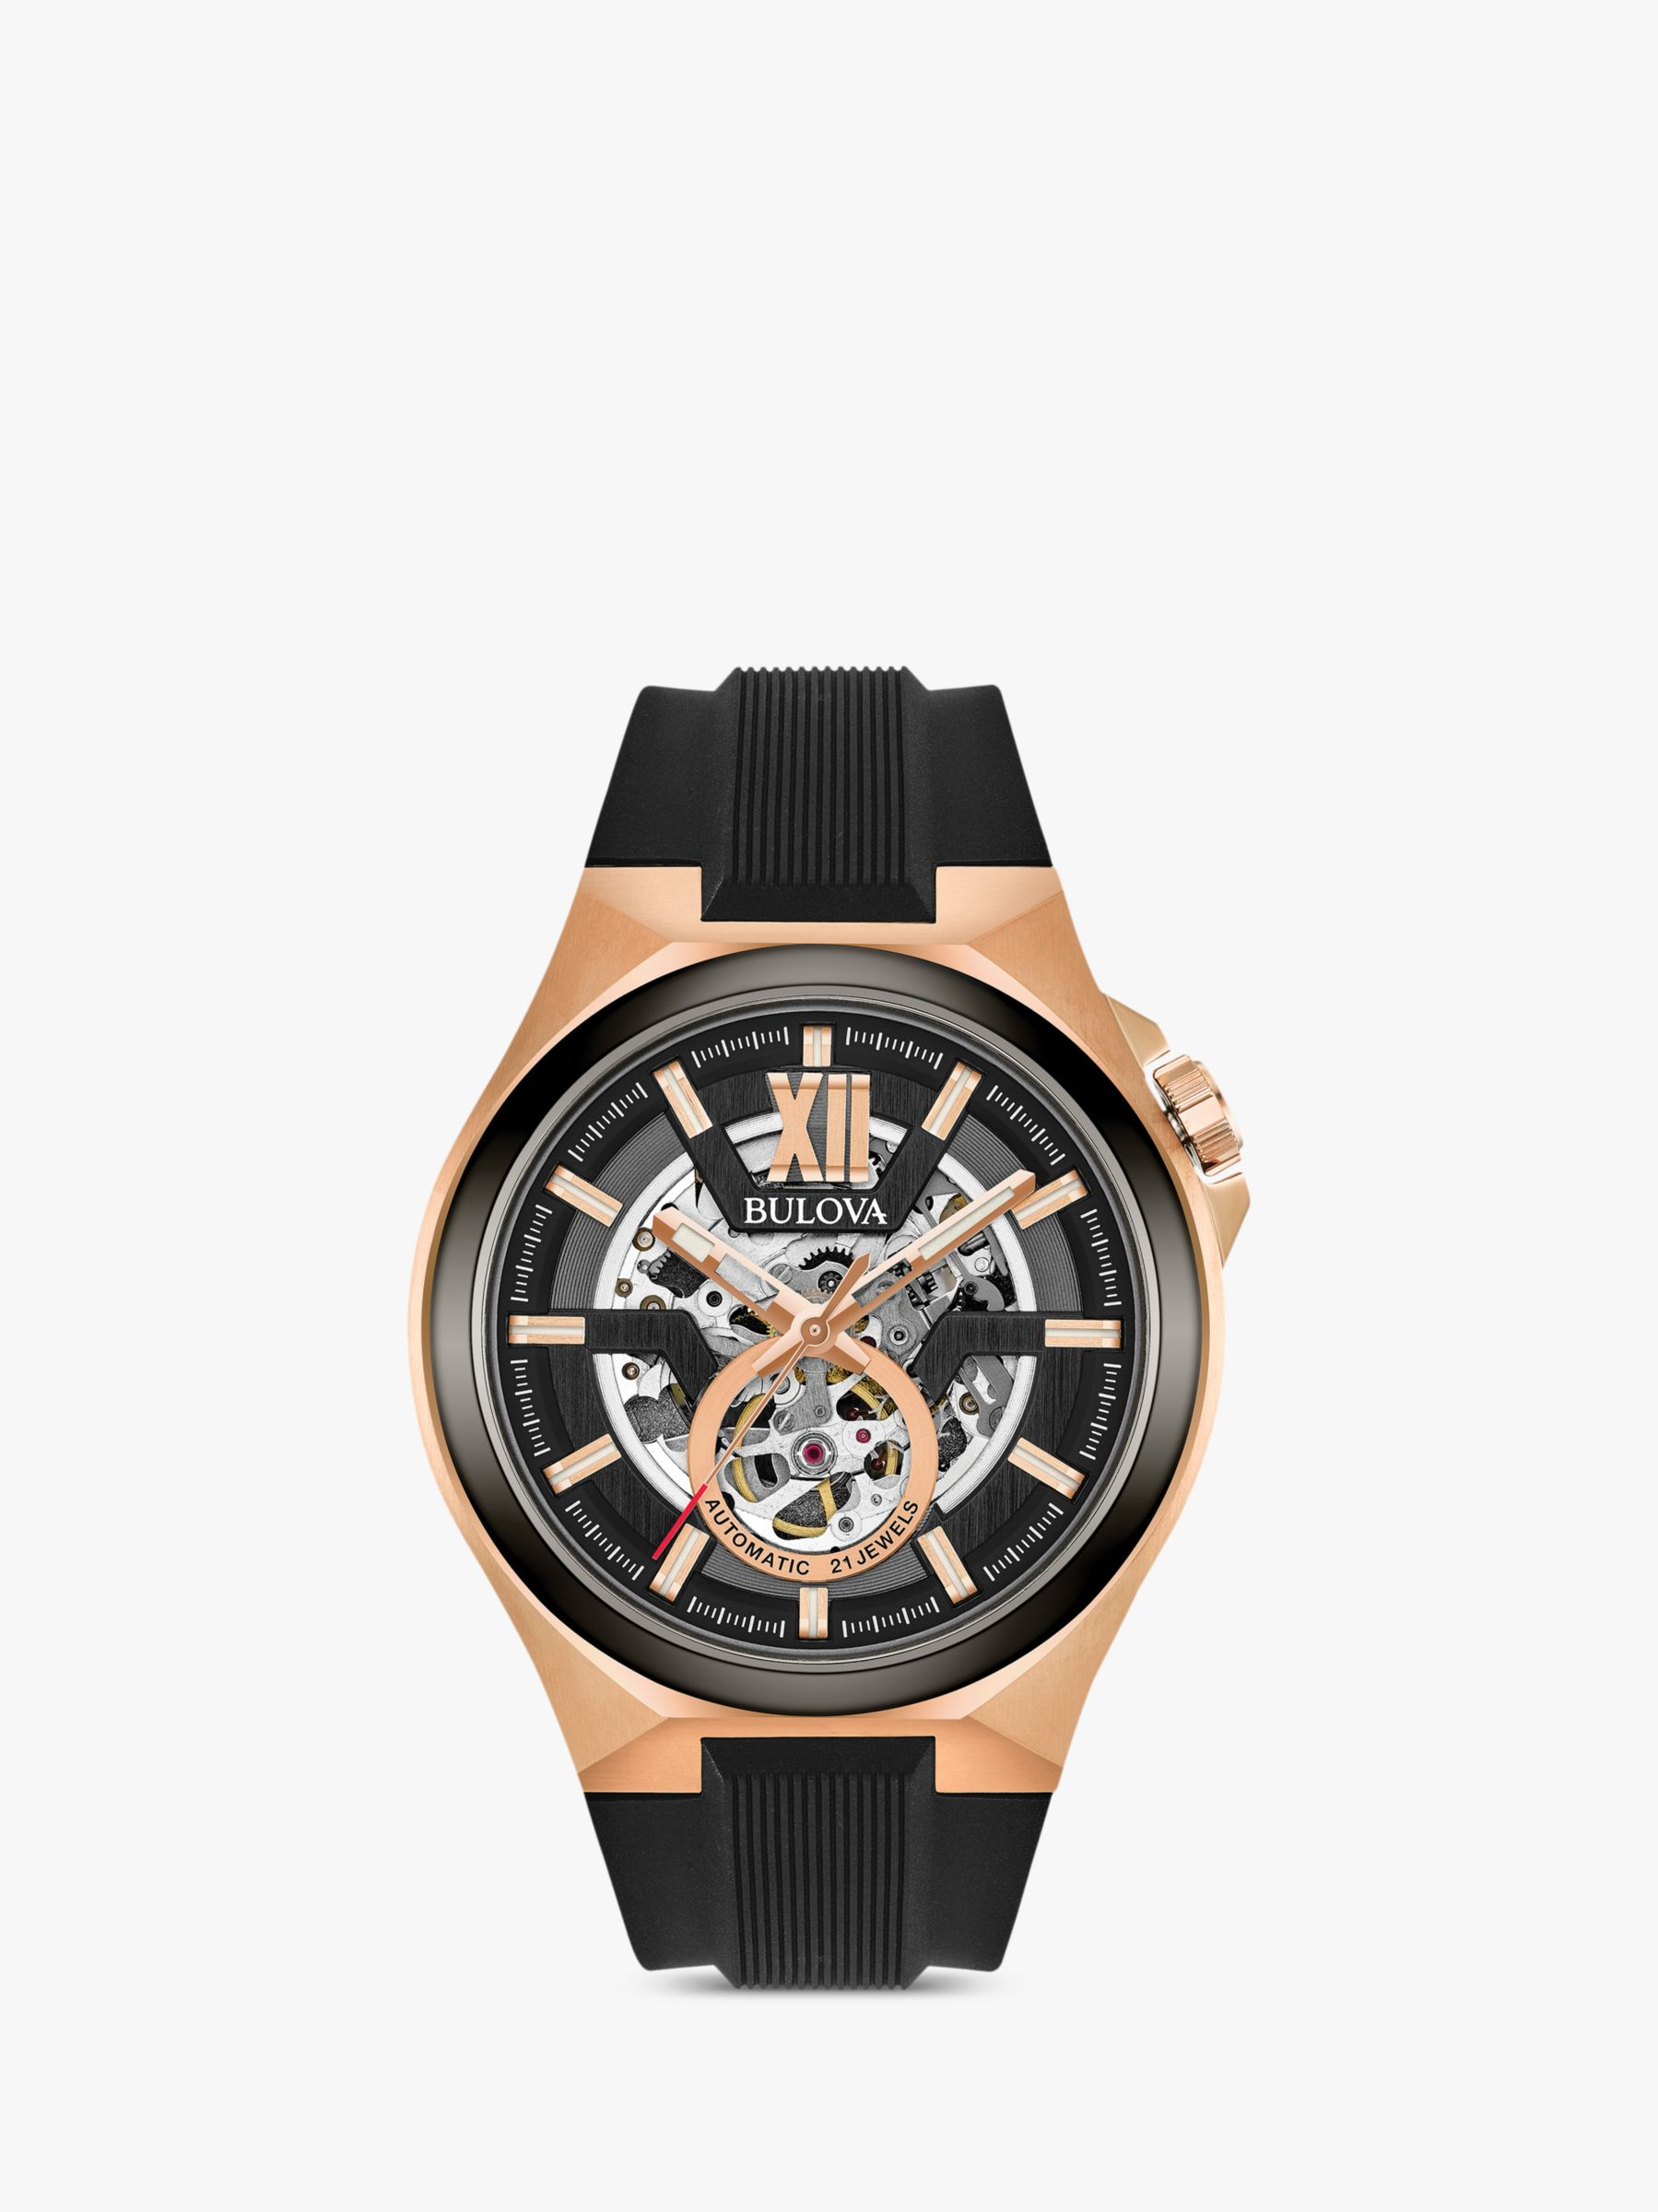 Bulova Bulova 98A177 Men's Automatic Skeleton Rubber Strap Watch, Black